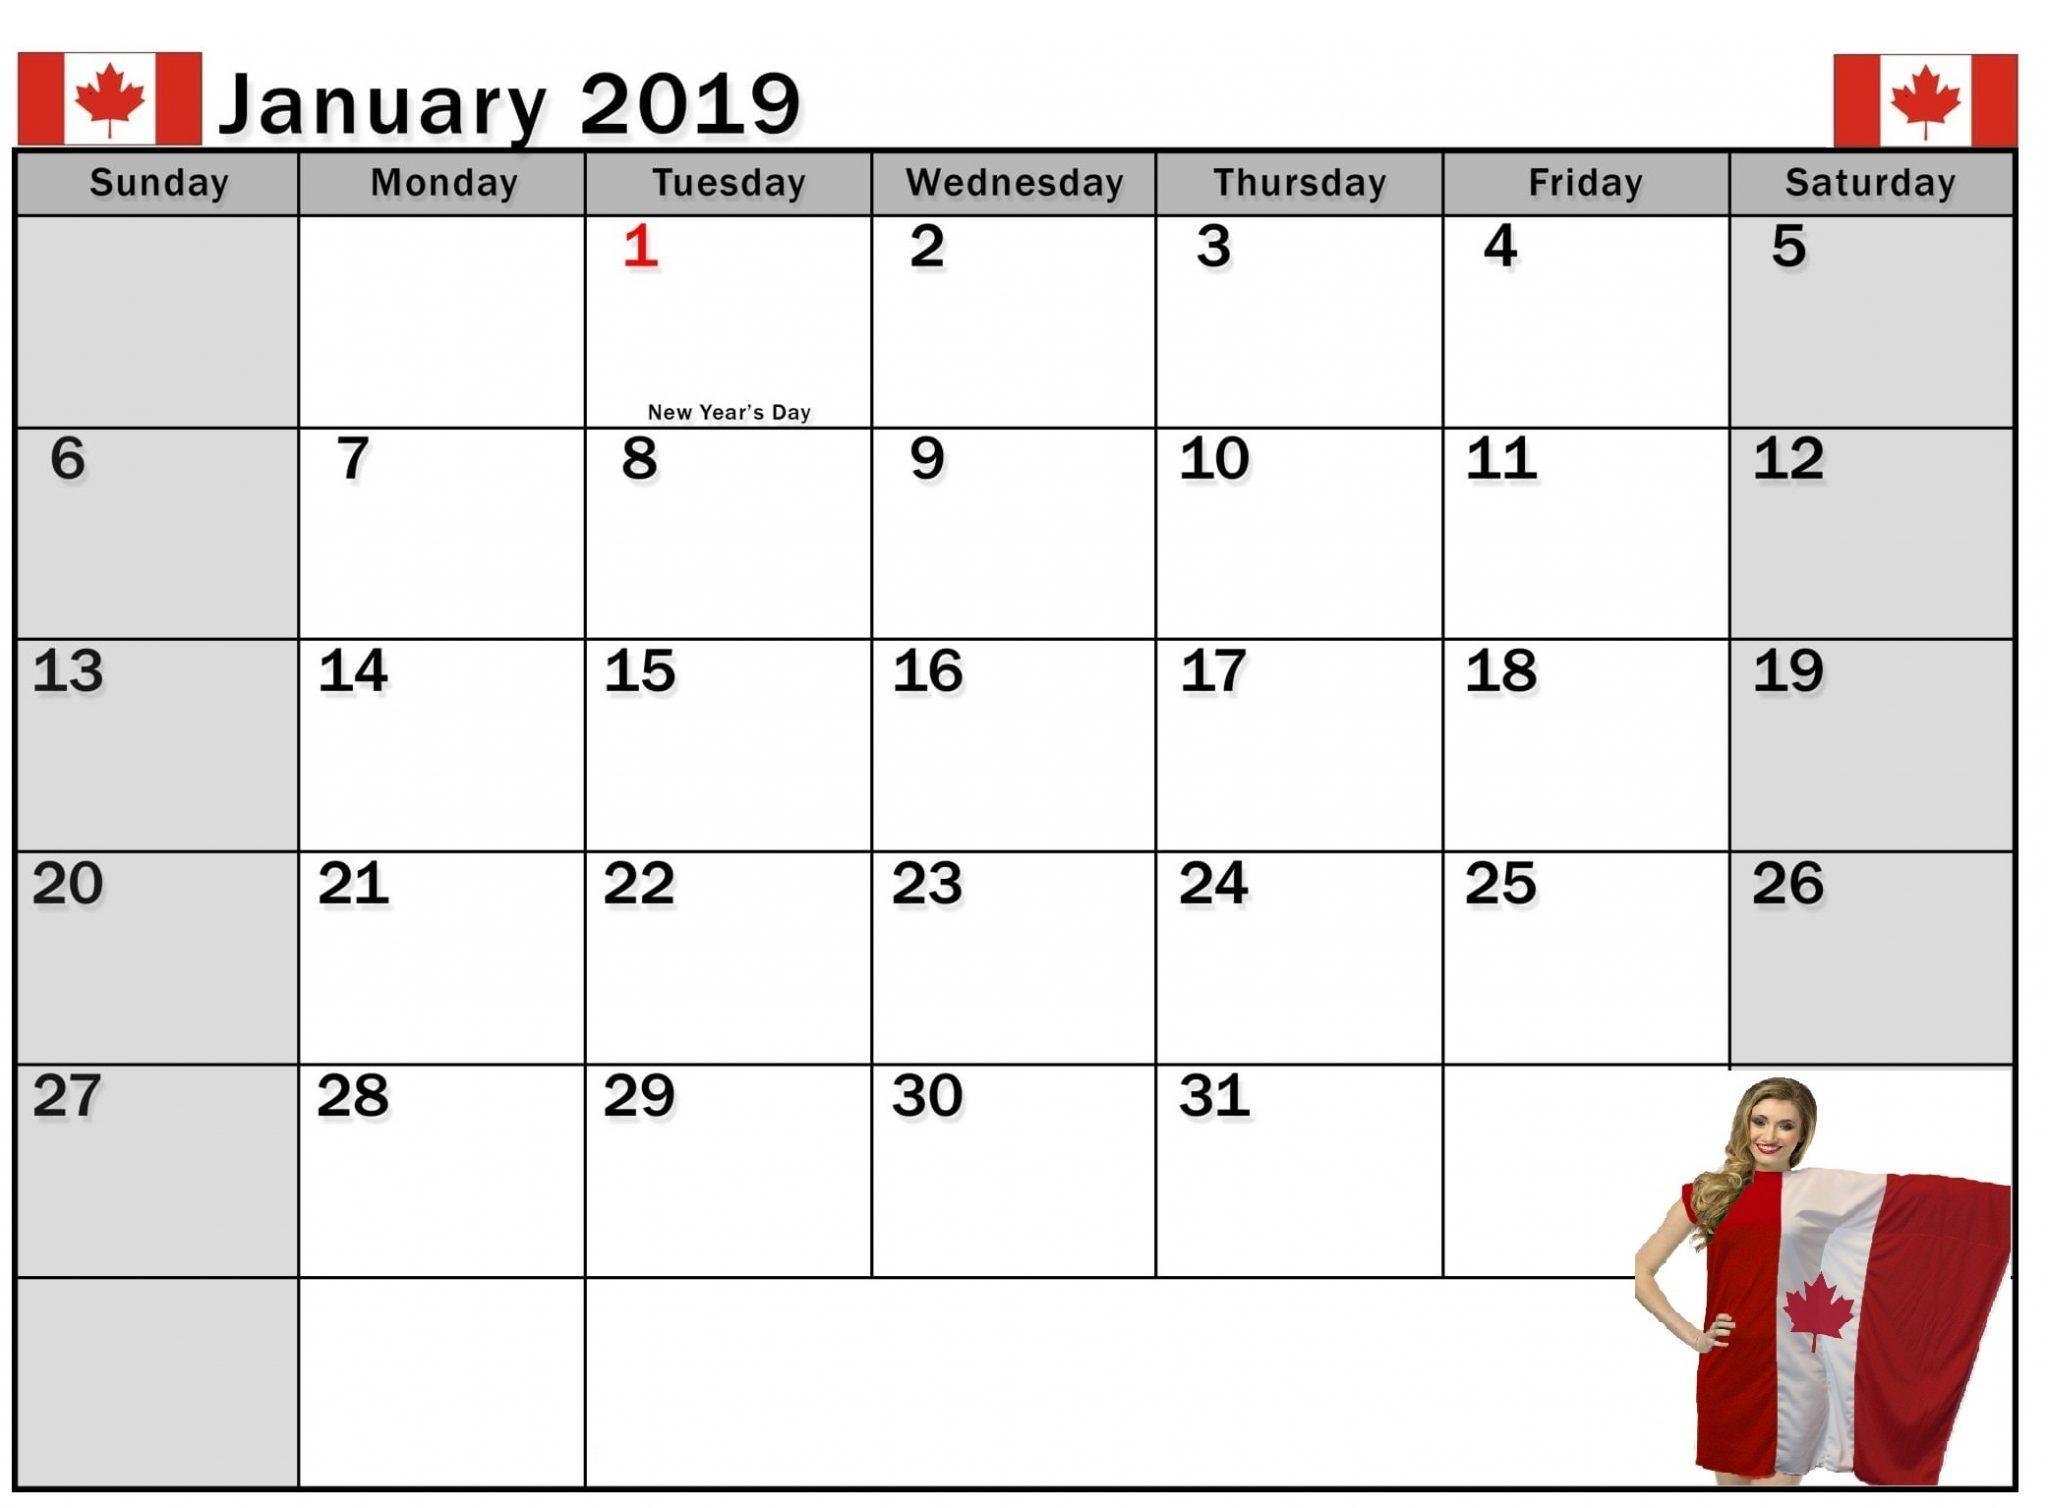 Holidays Calendar January 2019